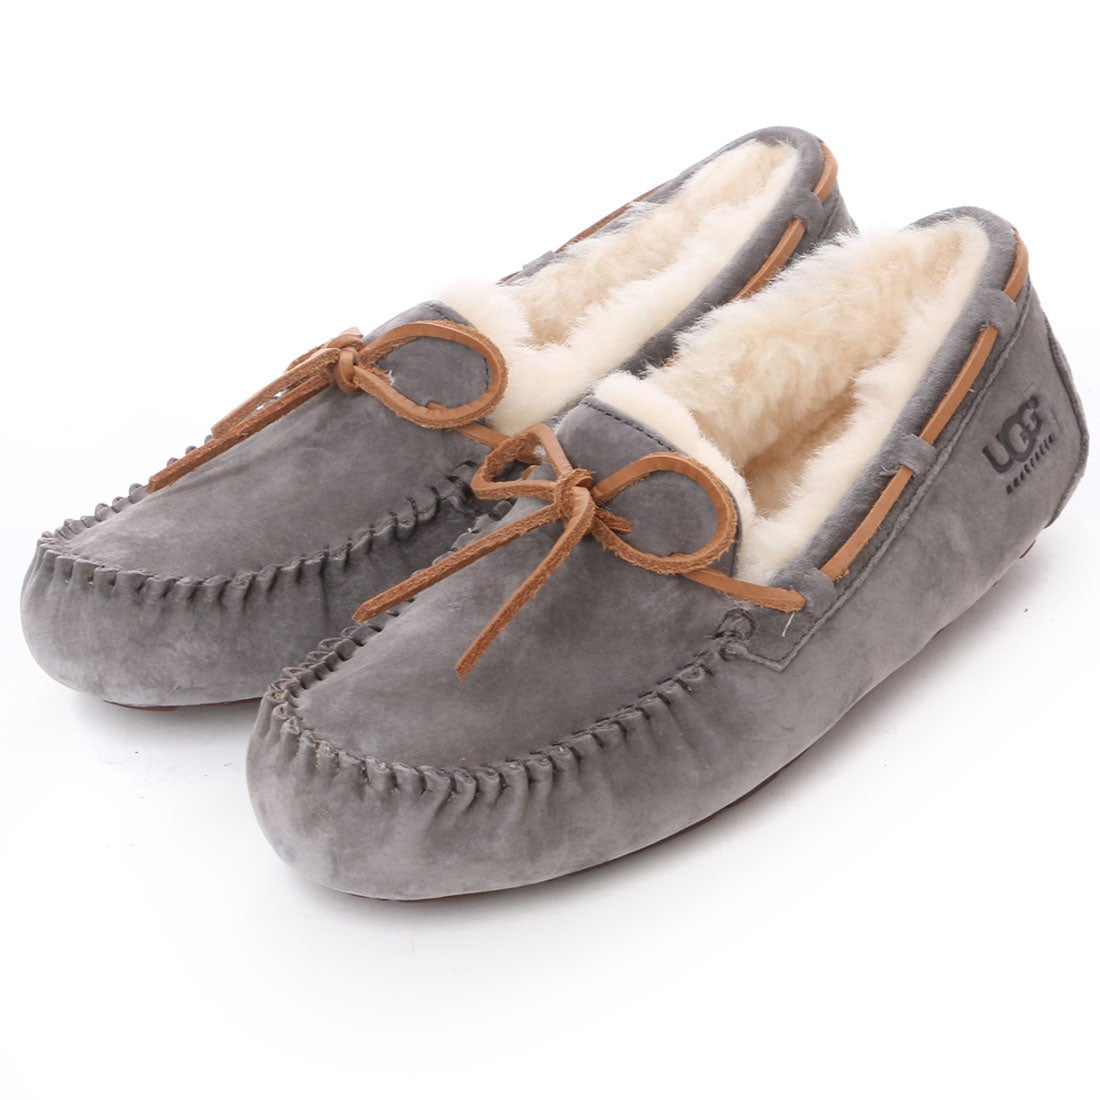 855c9808a4a アグ UGG Dakota (Pewter) -靴&ファッション通販 ロコンド〜自宅で ...